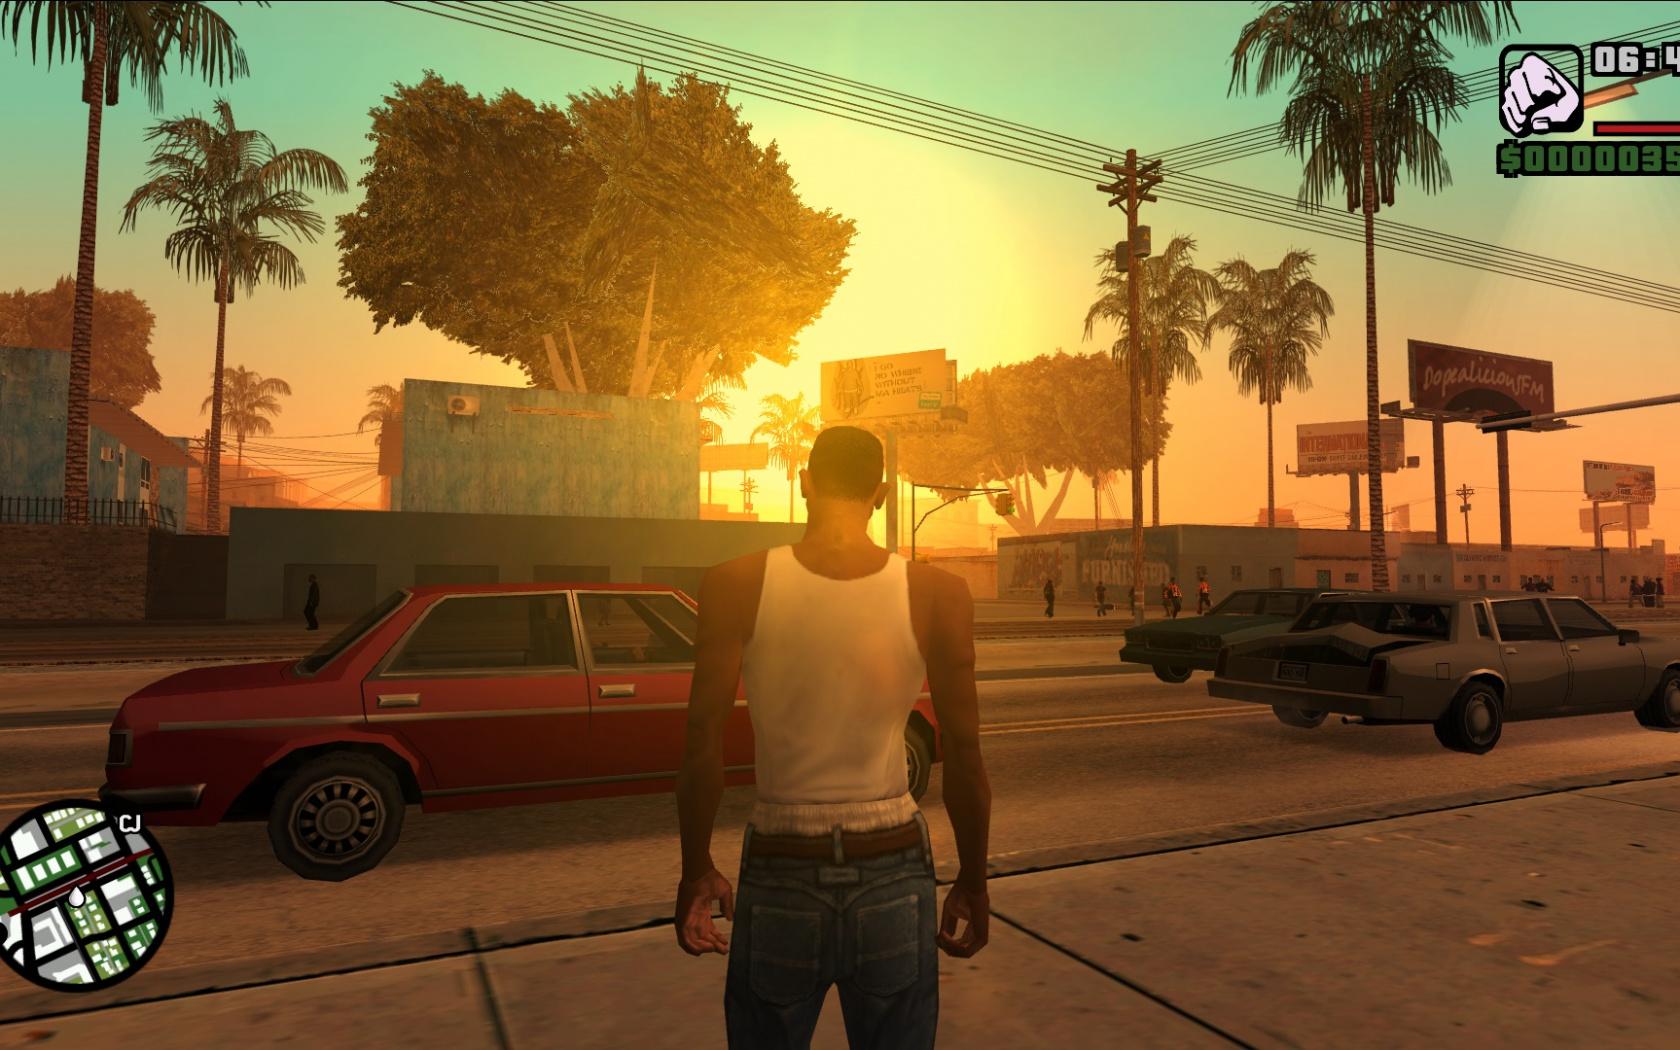 видео графику Gta San Andreas подтянули до уровня Gta V